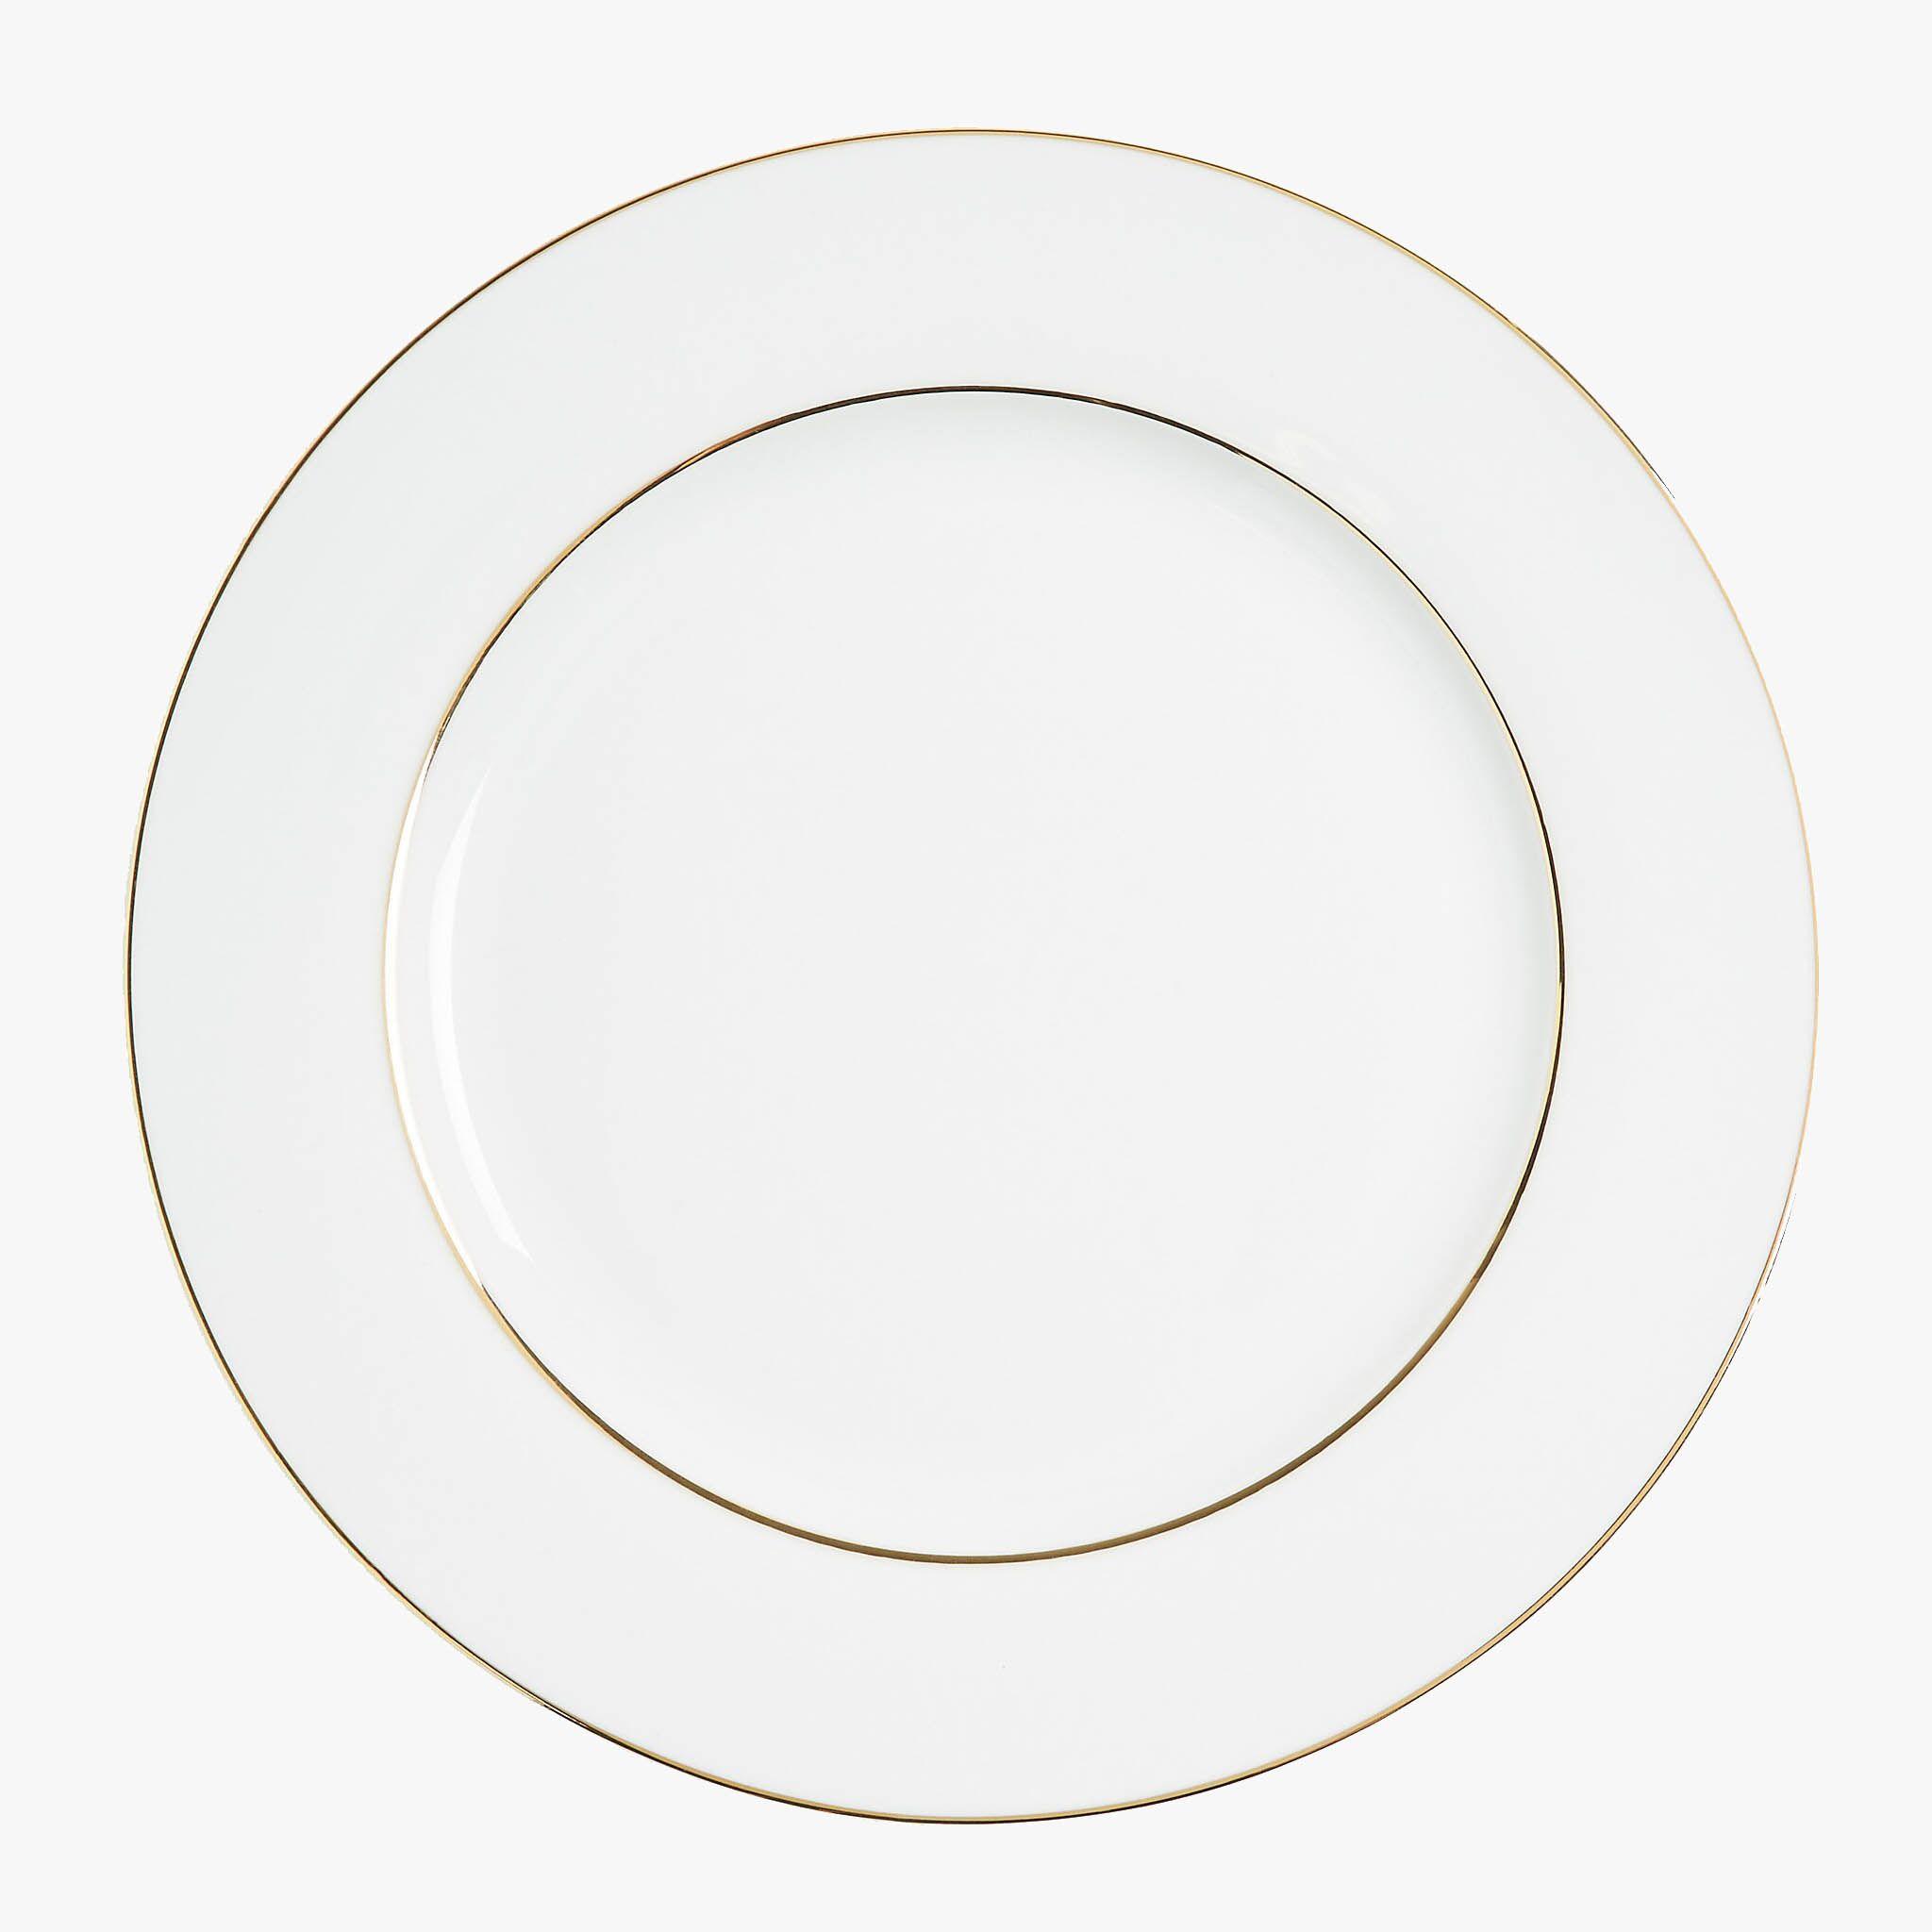 225 & Tableware   Table Linen Cutlery Glasses u0026 Serveware   John ...